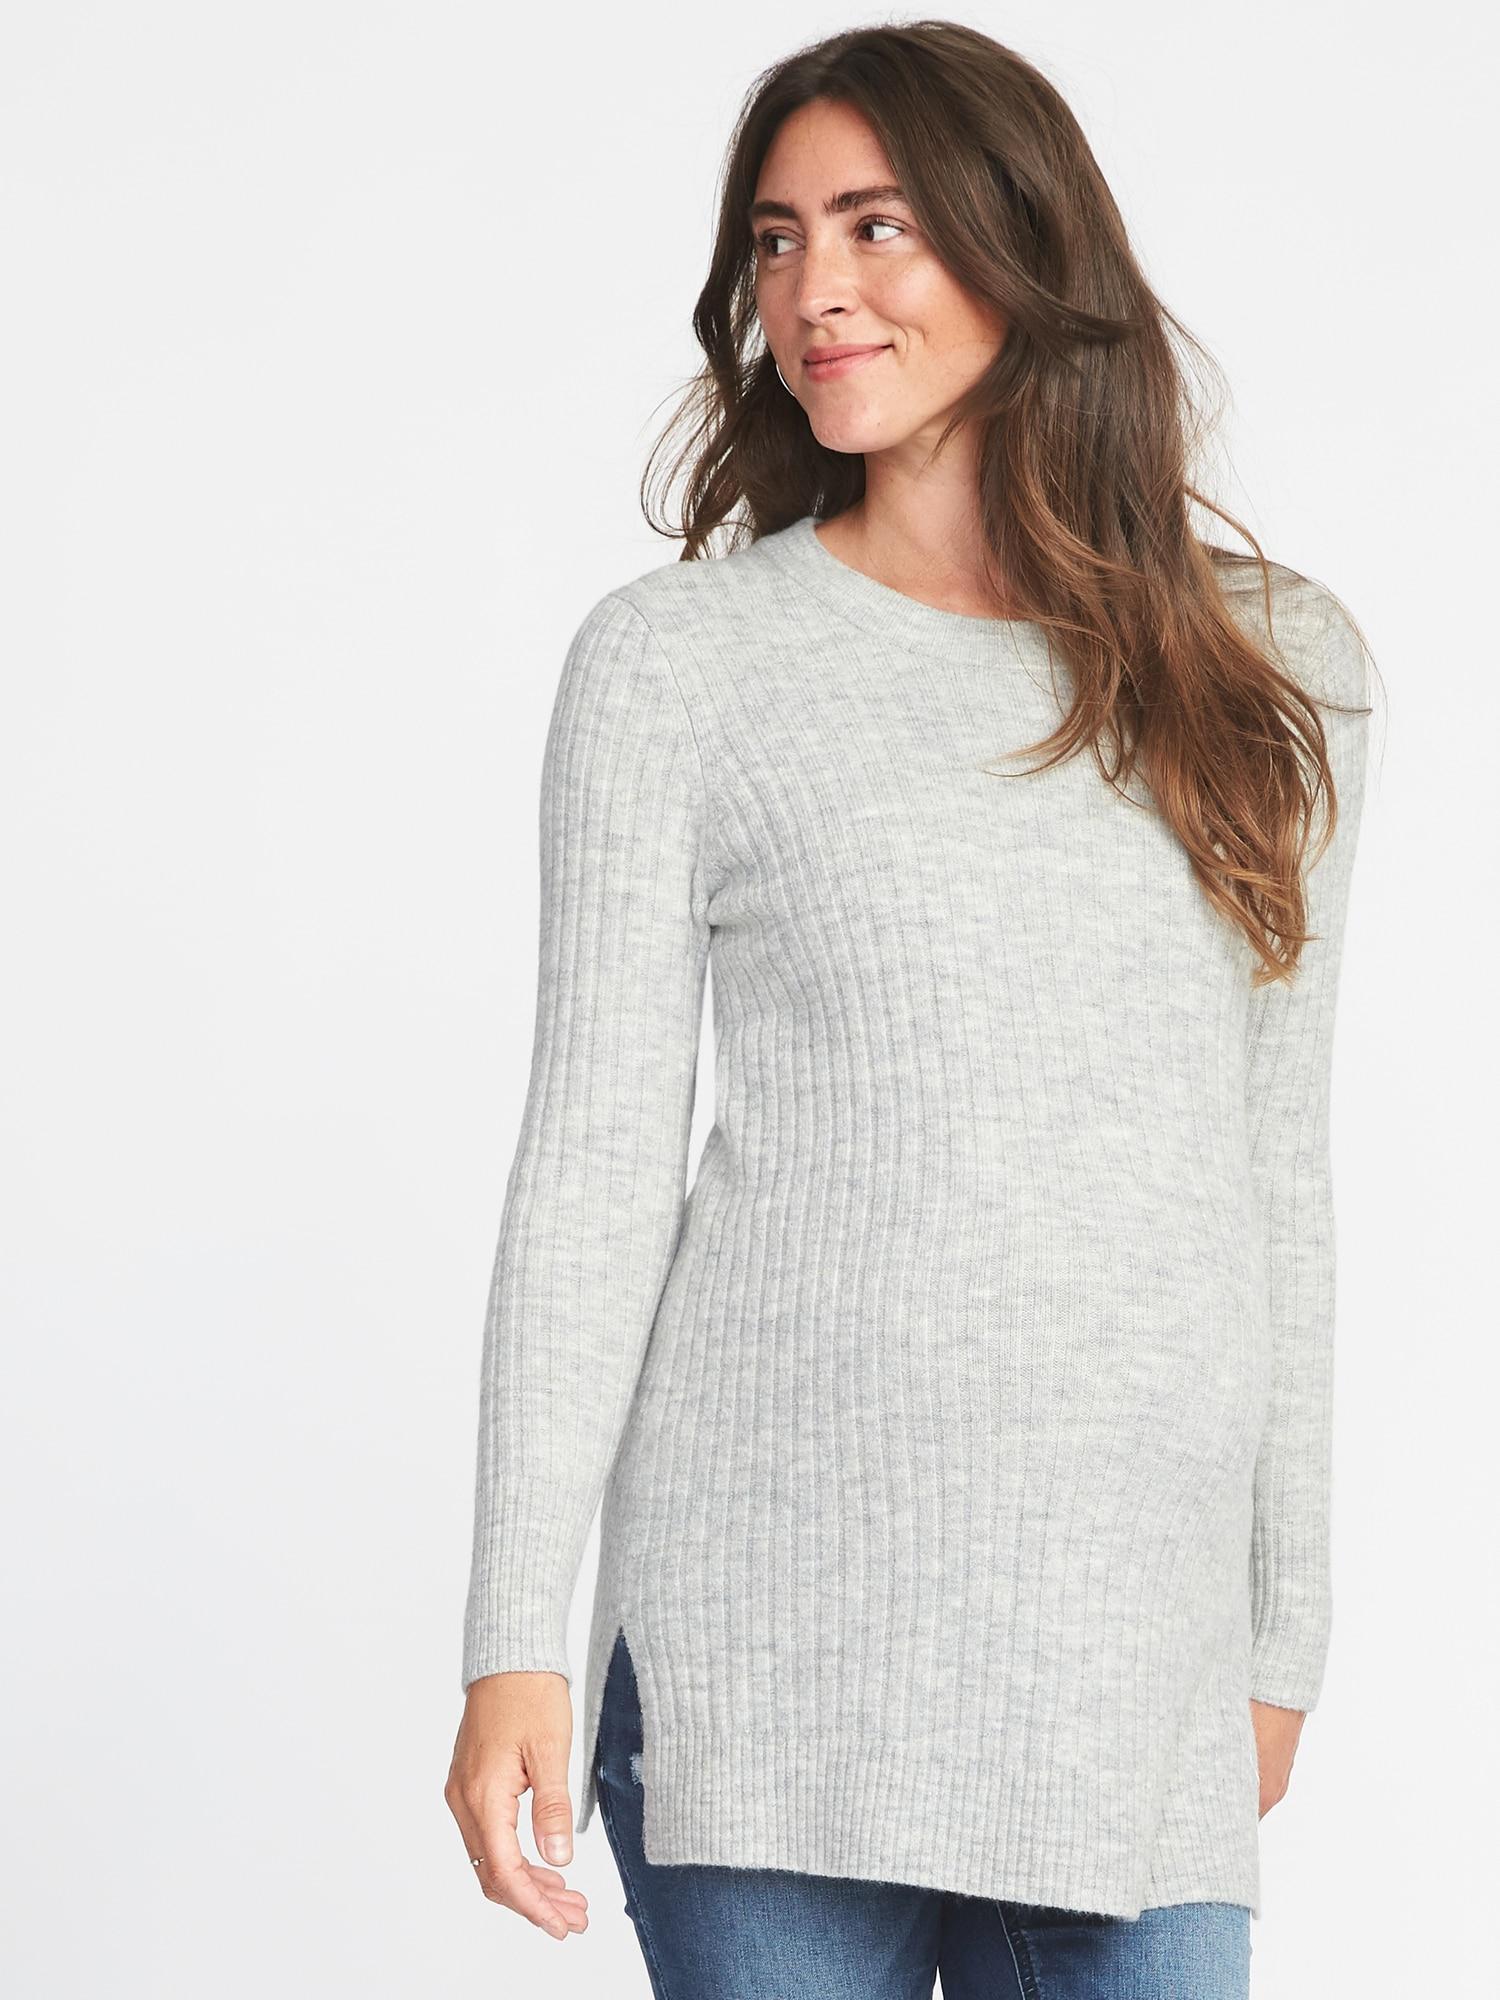 6b7c05d556306 Old Navy Maternity Plush Rib-knit Tunic Sweater in Gray - Lyst